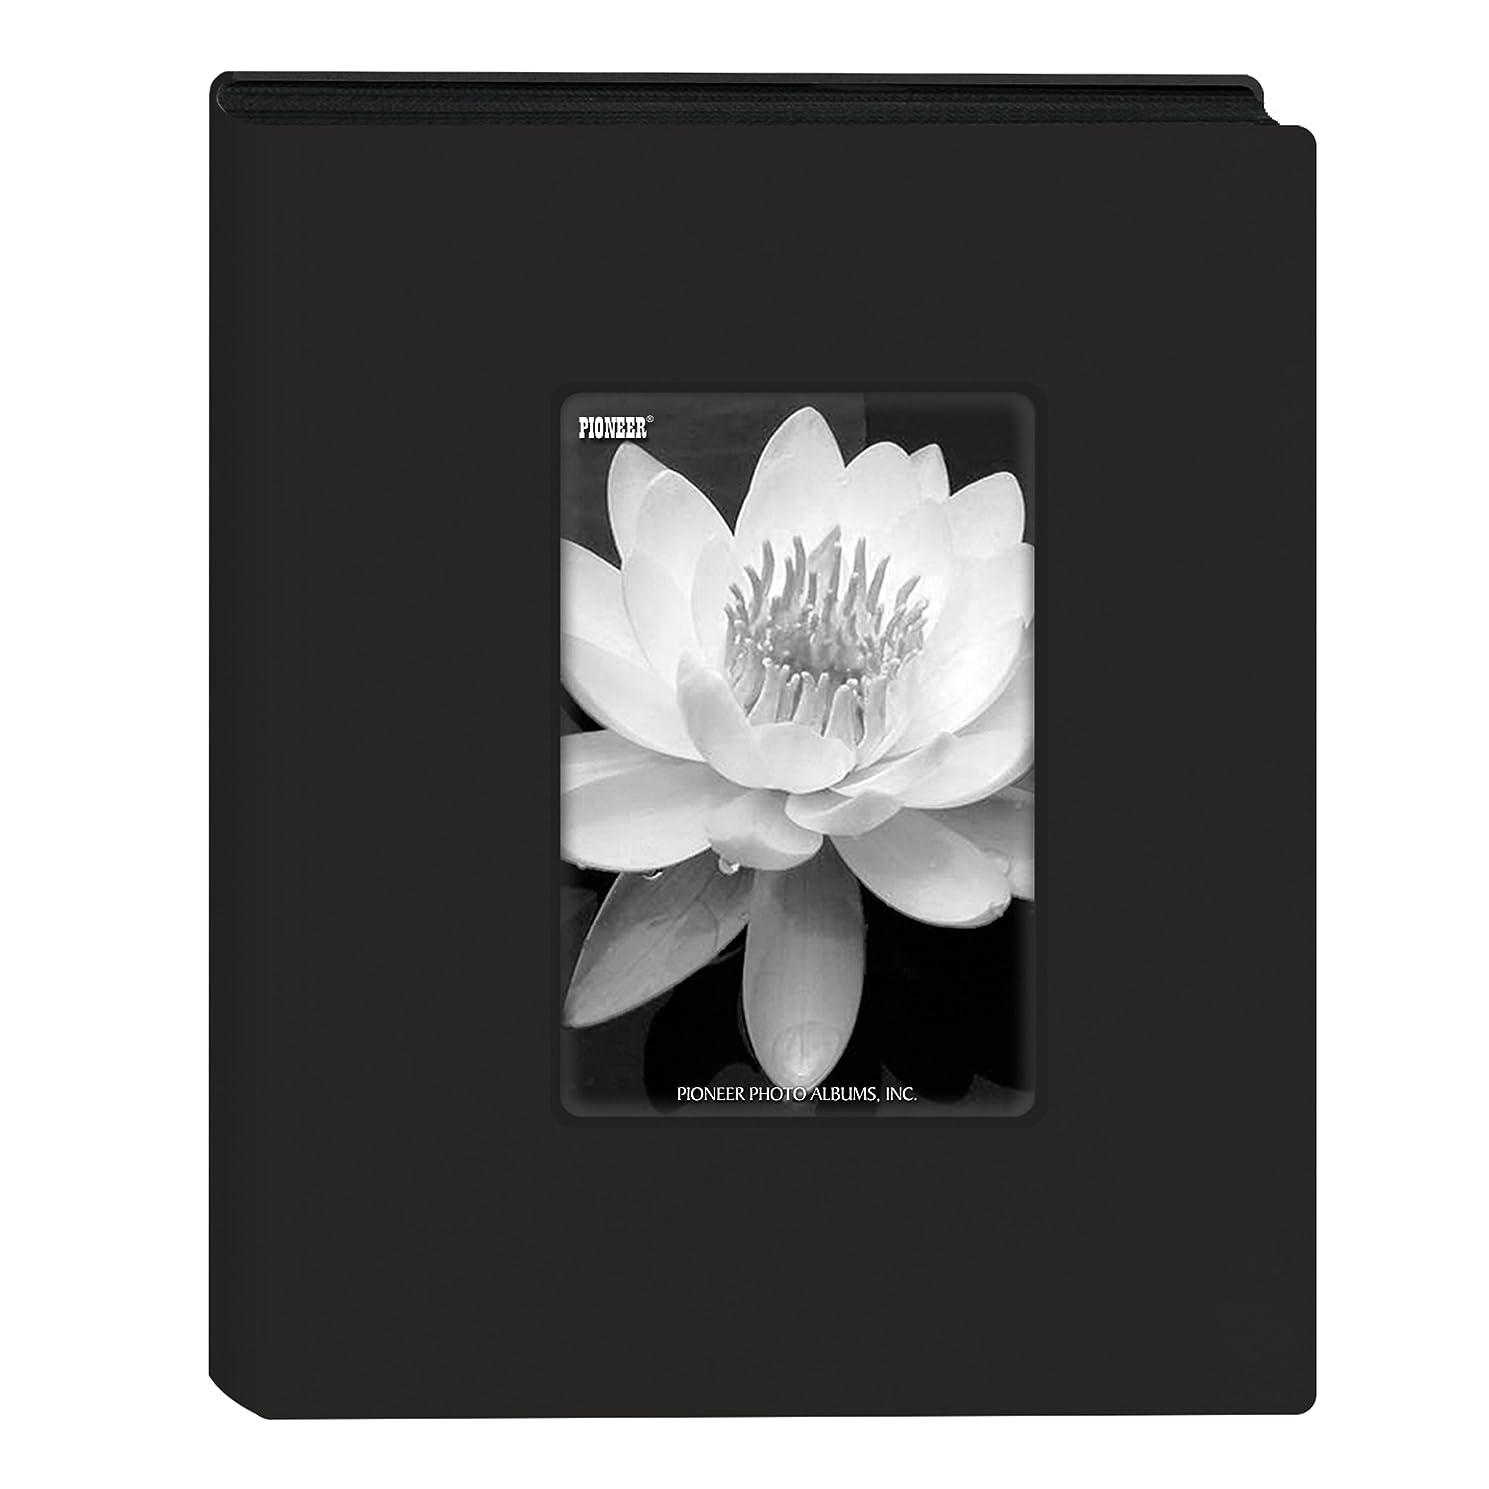 Pioneer Photo Albums KZ-46 Mini Frame Cover Photo Album 24 Pkt 4x6, Black,